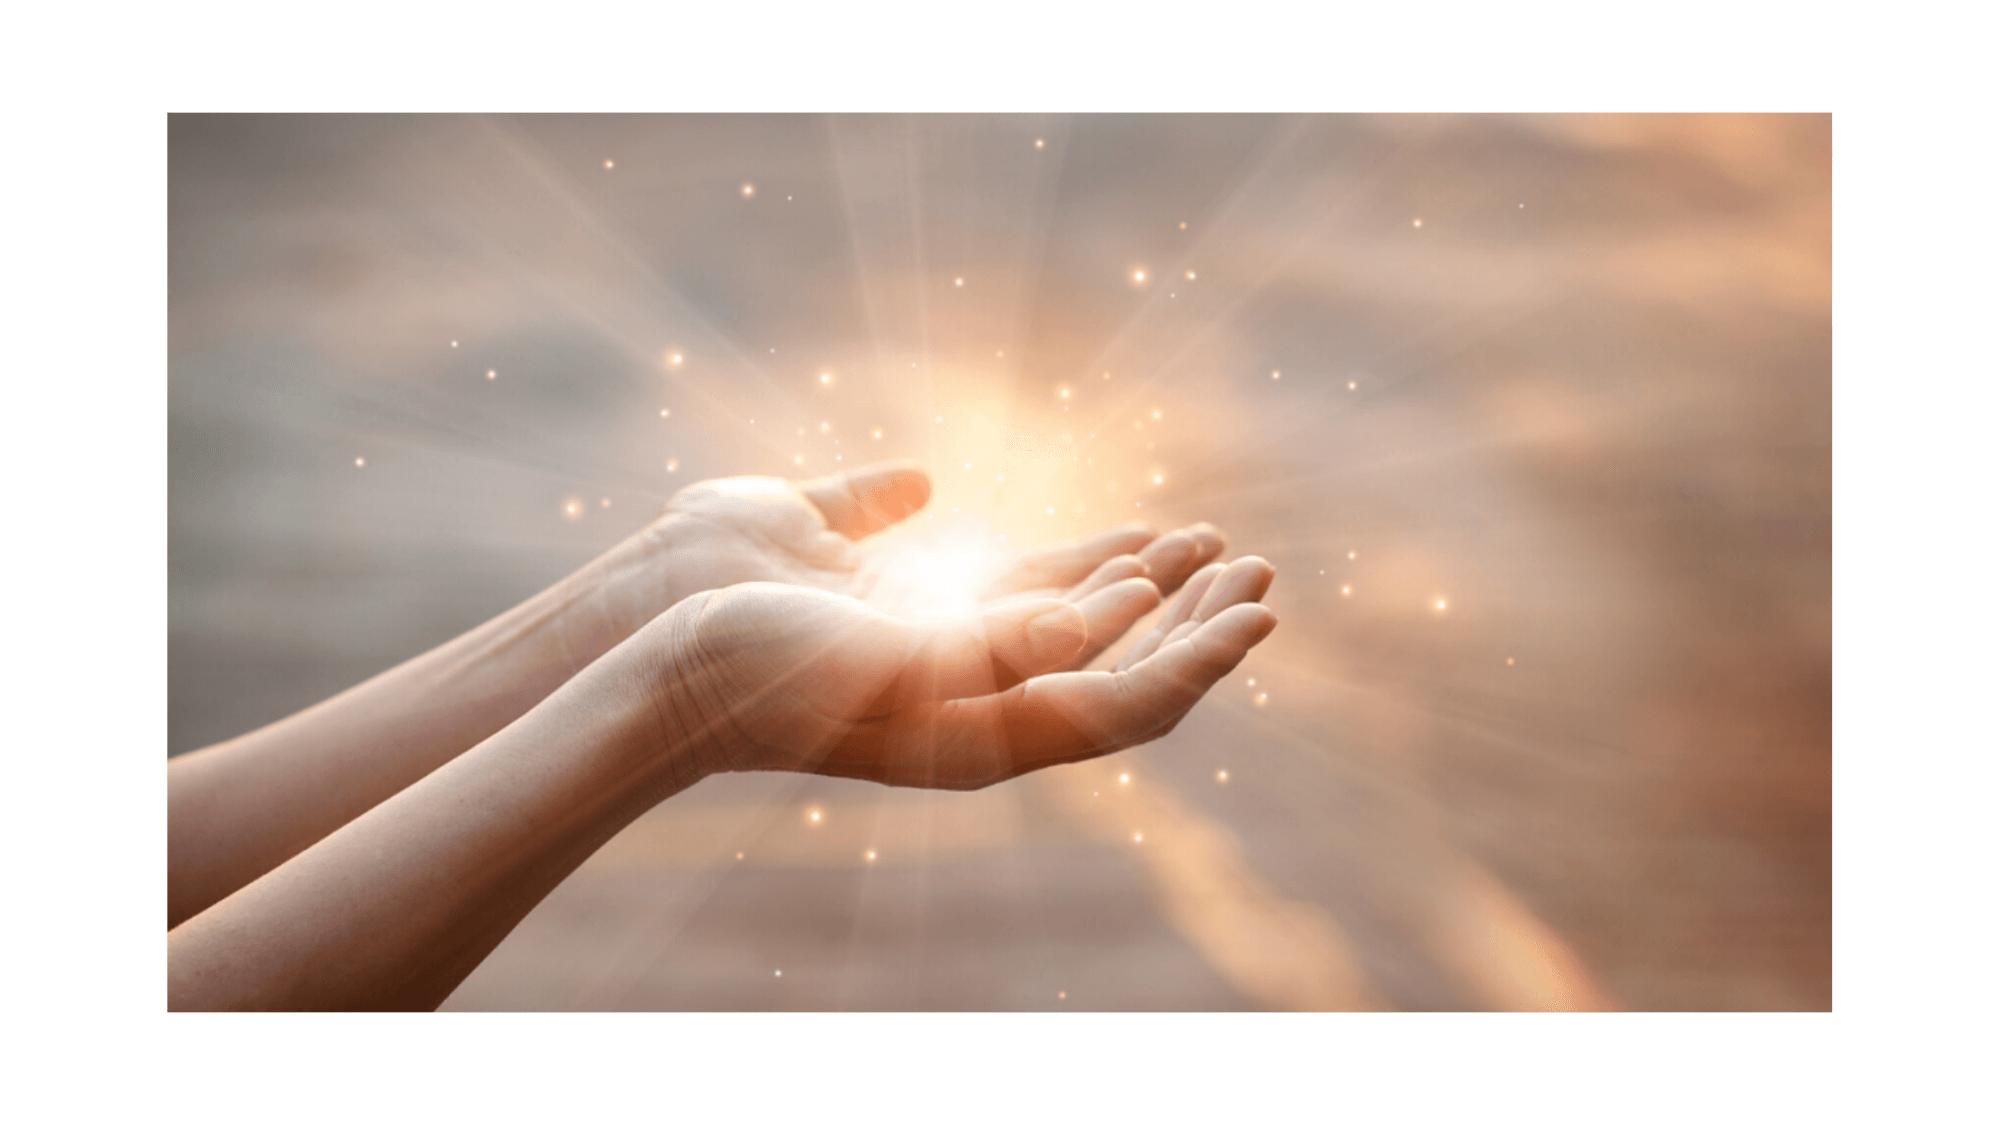 Hands holding light burst-Keeping Christ Close